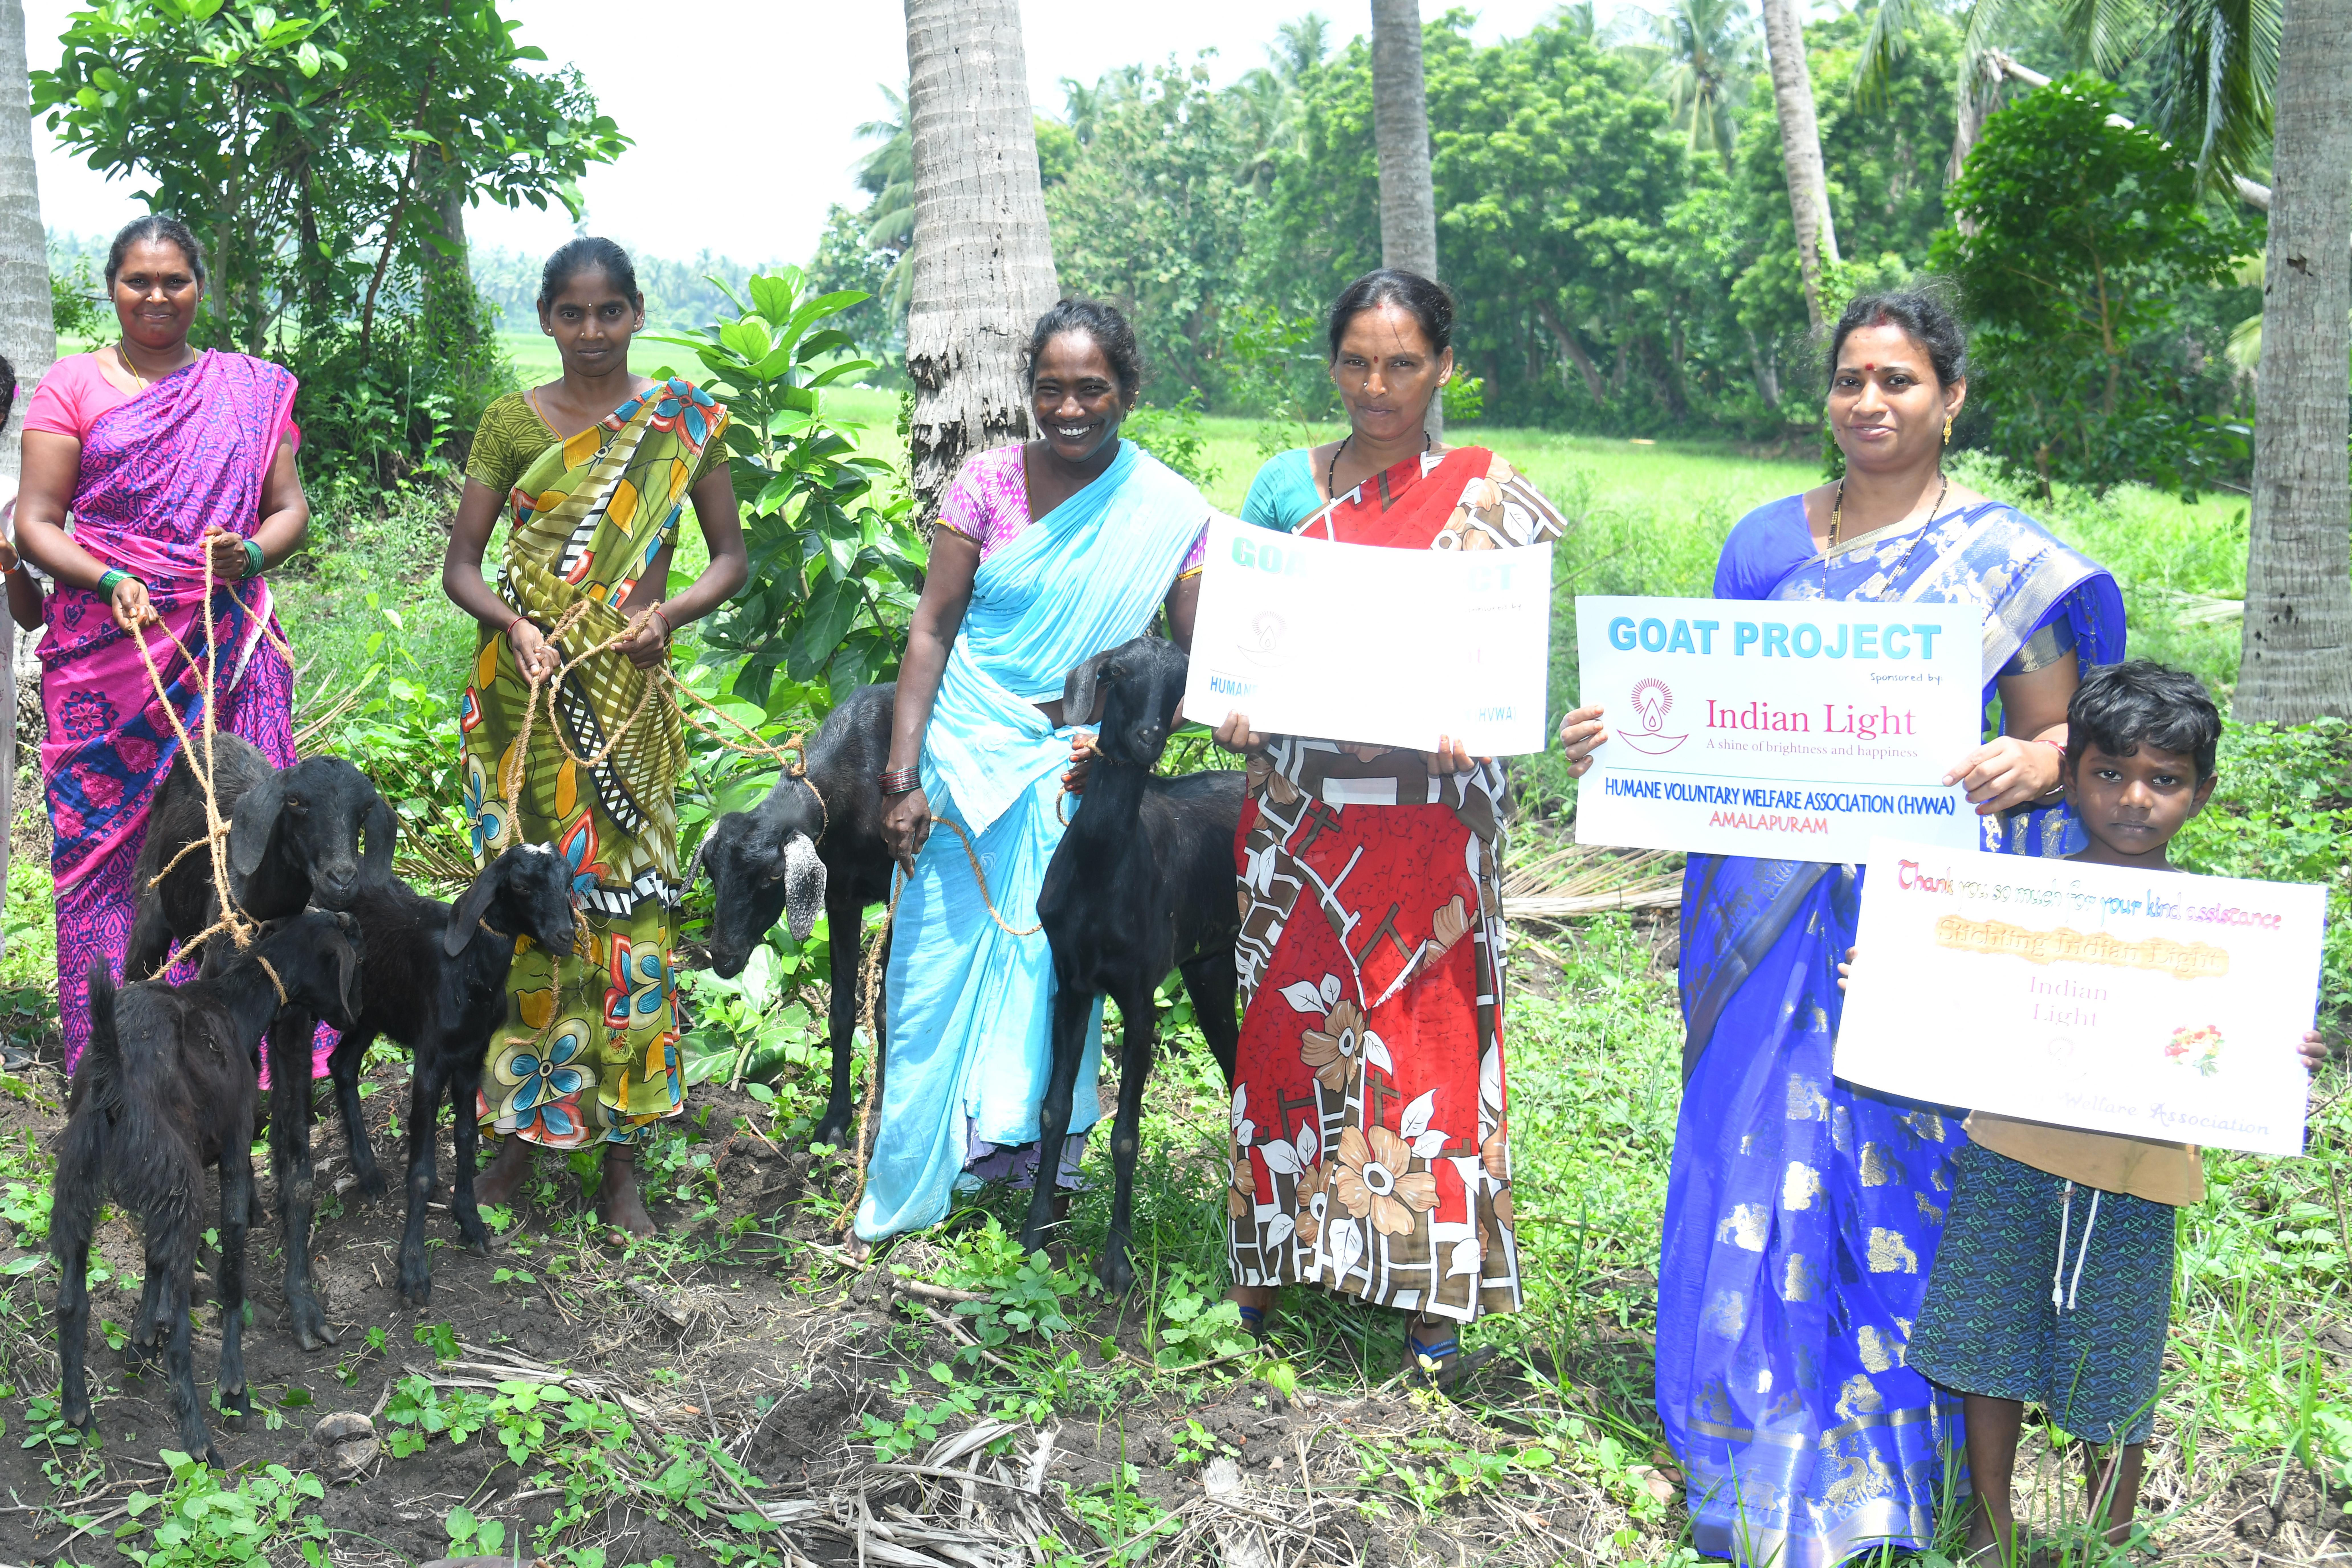 Goat project ILF India